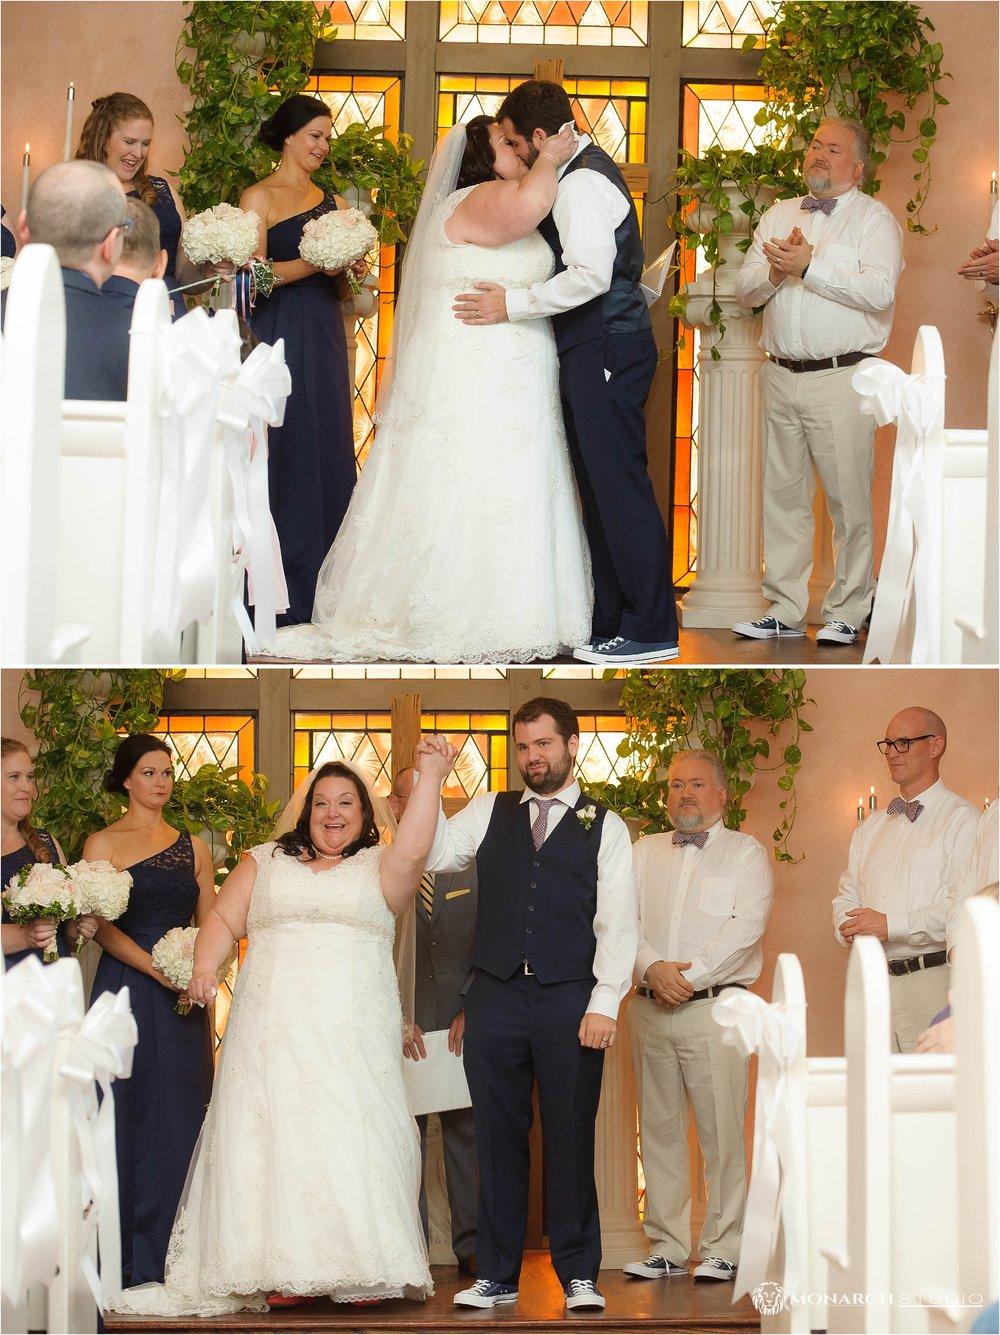 st-augustine-photographer-intimate-wedding-025.jpg